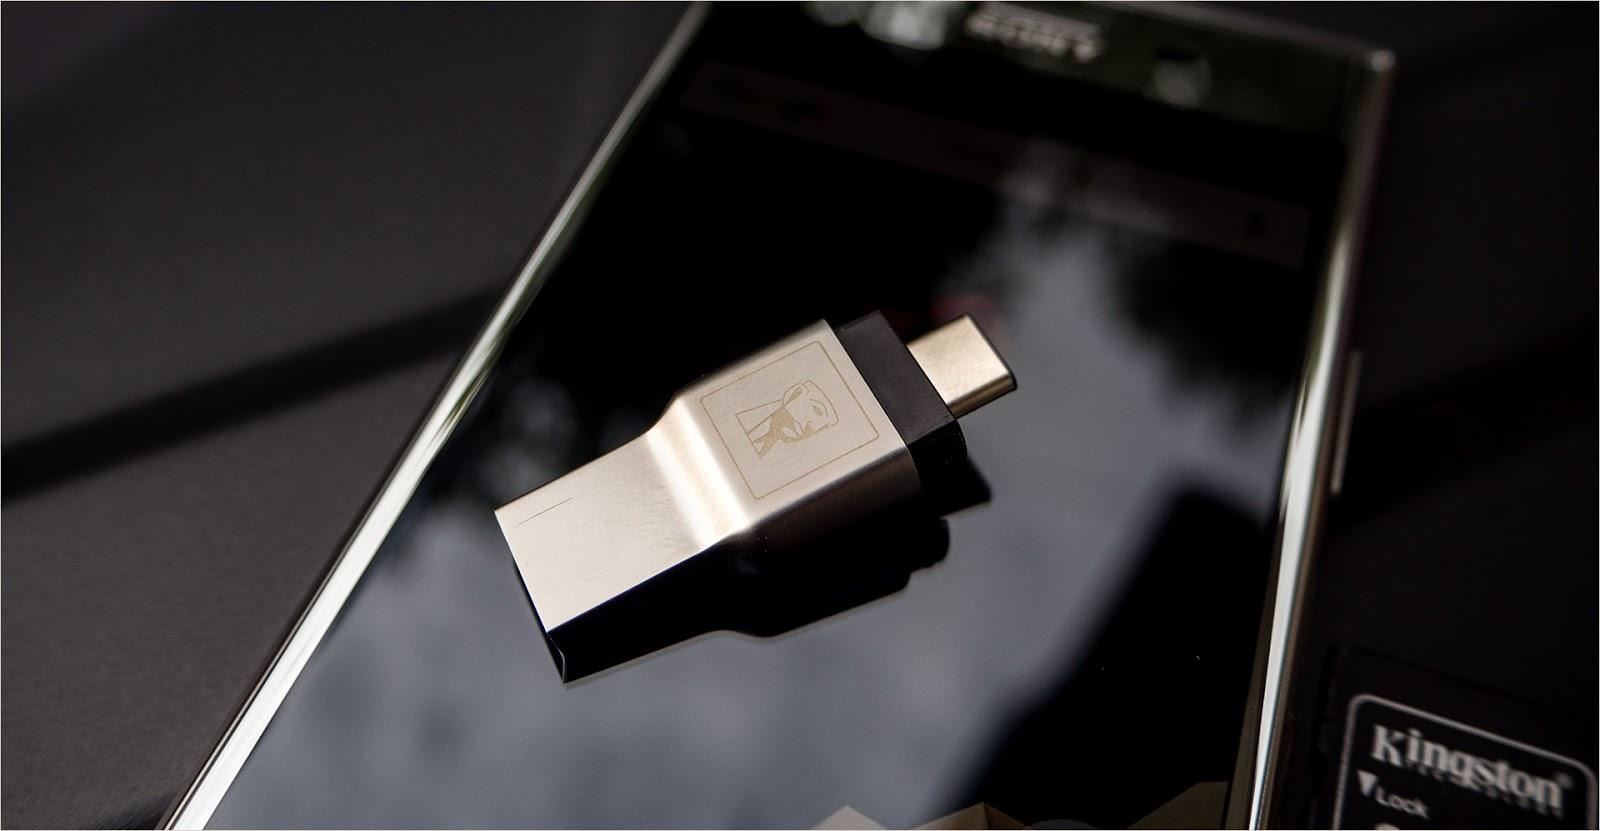 Kingston Duo 3C — палочка-выручалочка для MicroSD карт памяти - 10